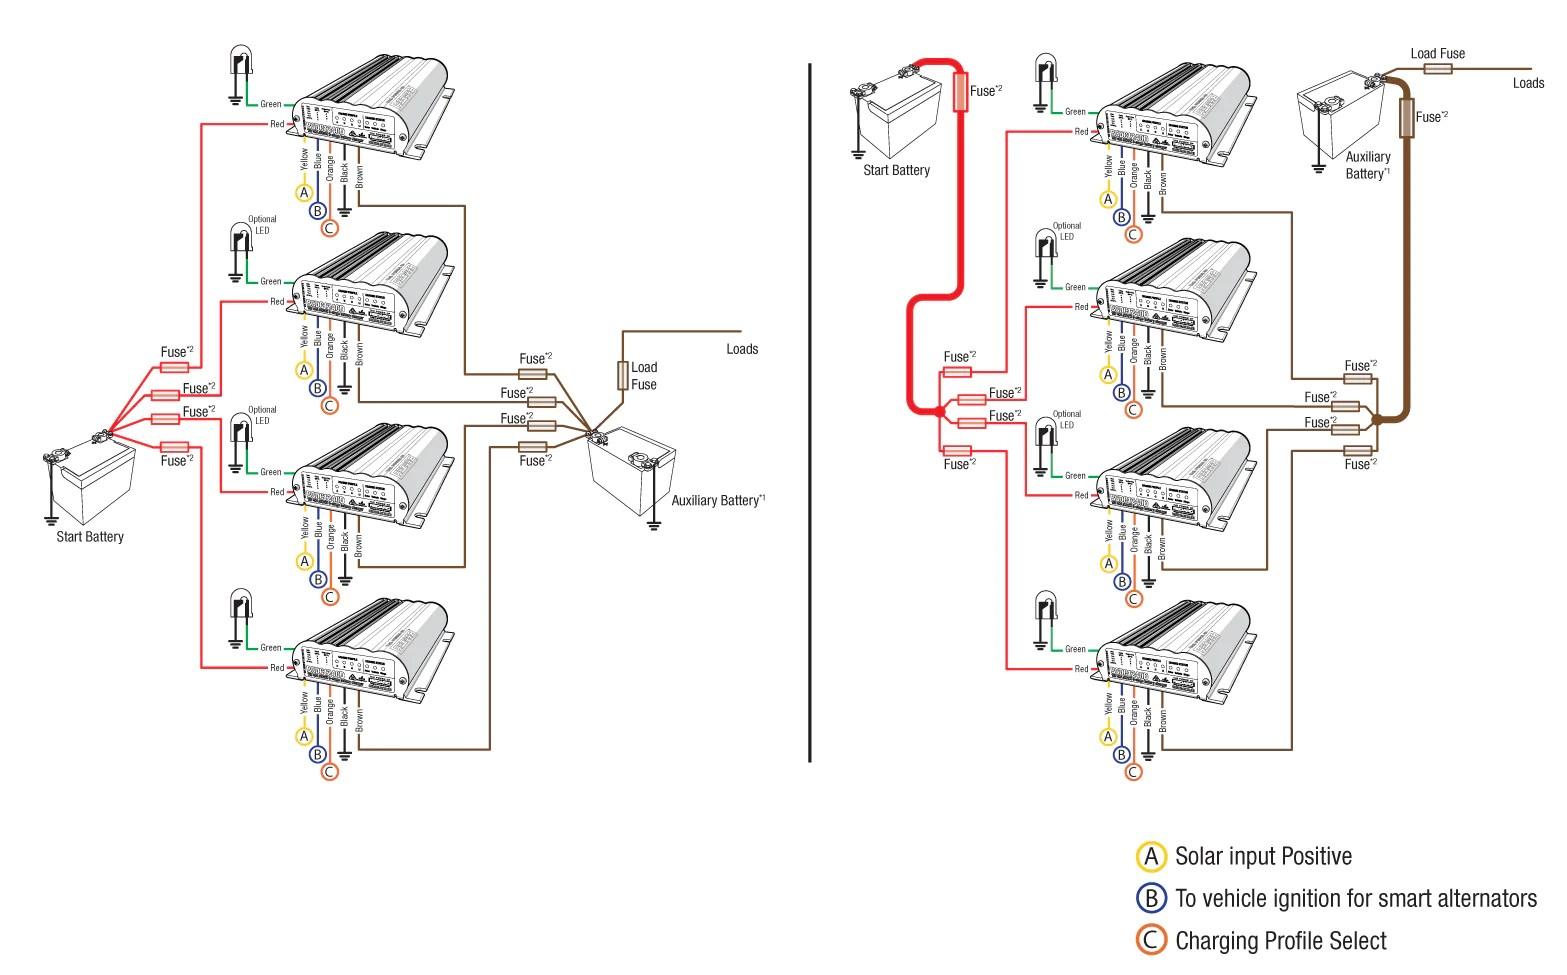 Rv Battery Wiring Diagram Besides Rv Parallel Battery Wiring Diagram